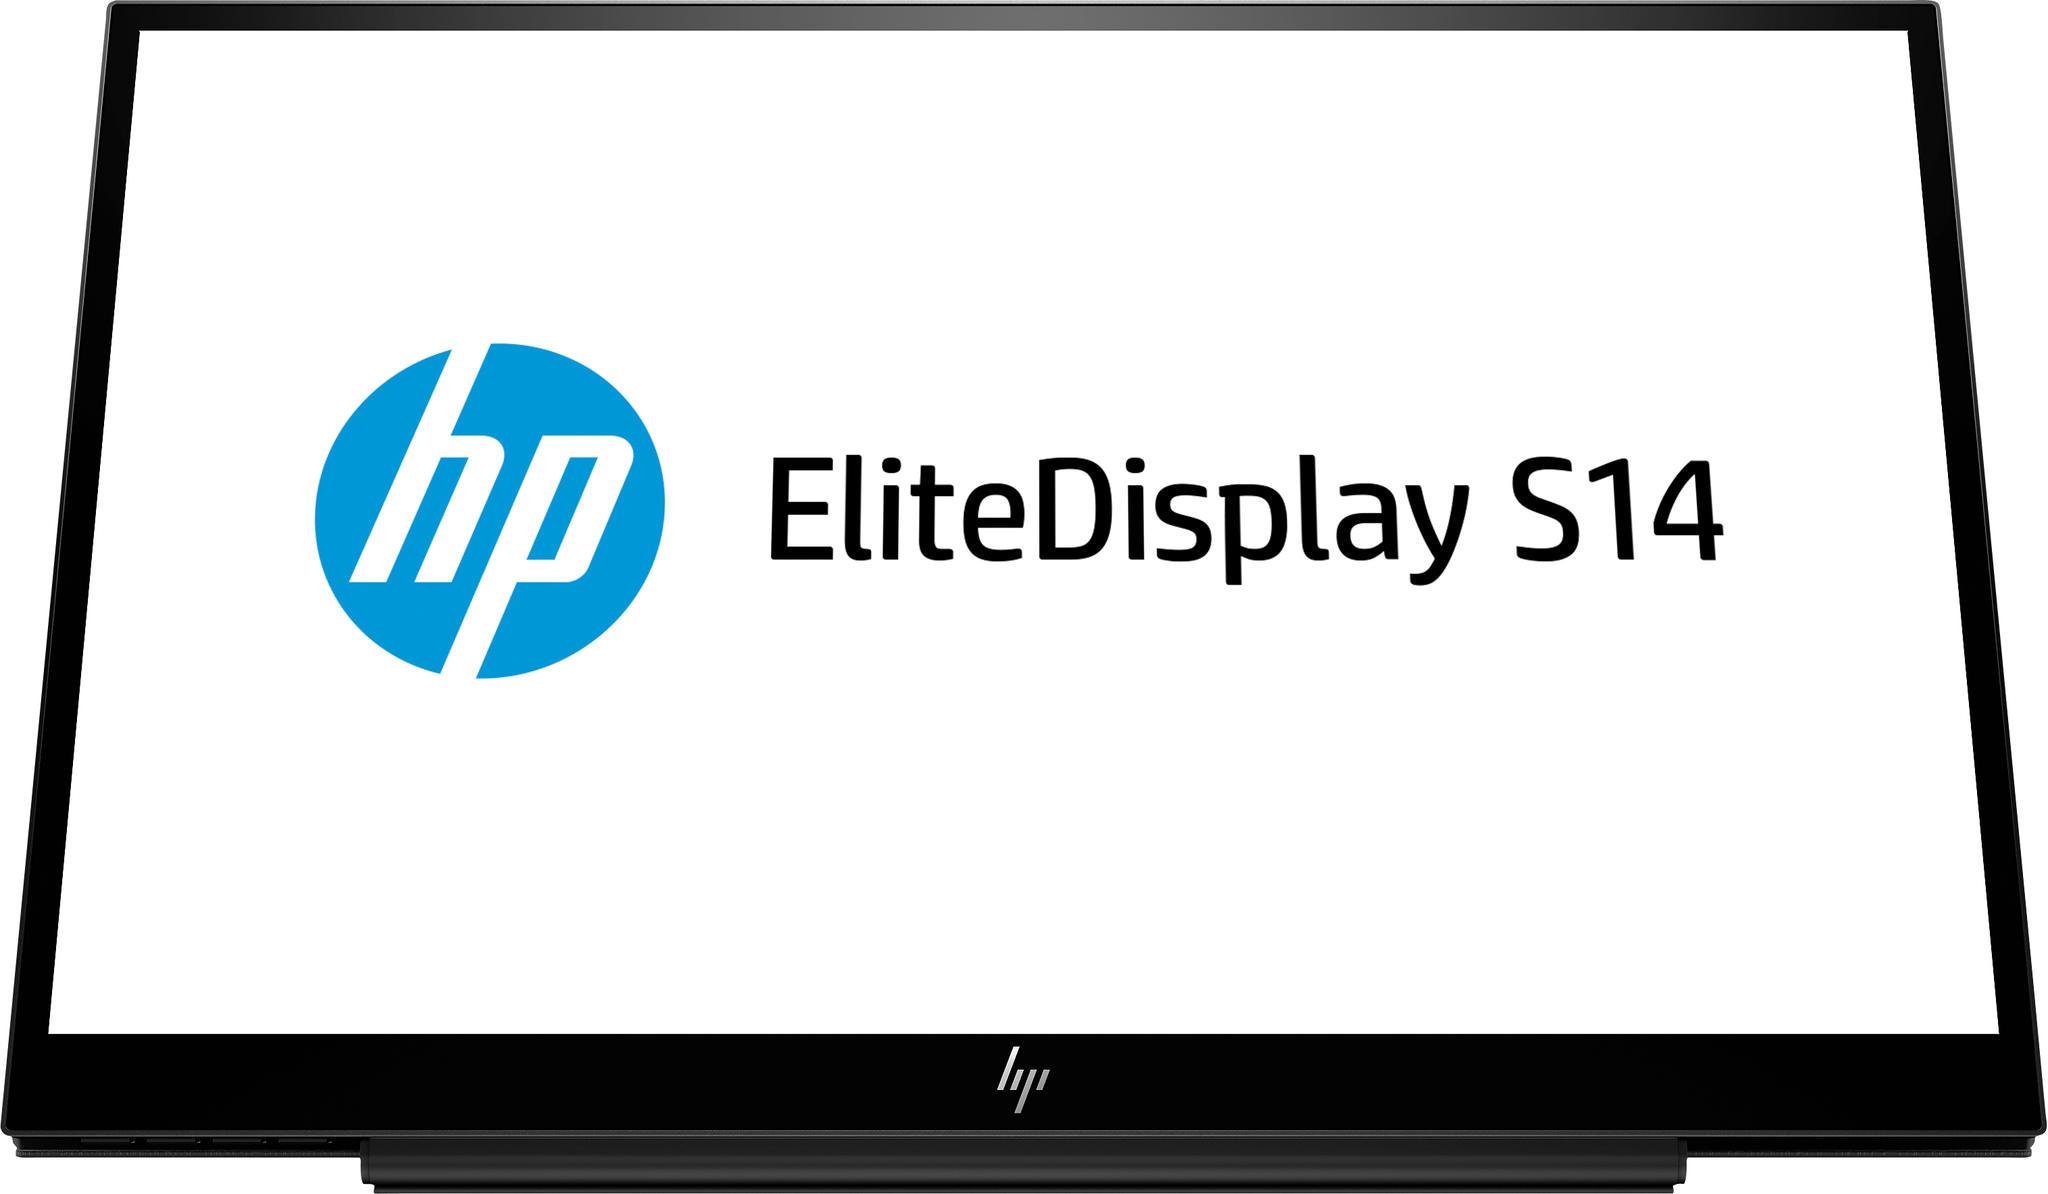 HP EliteDisplay S14 monitor